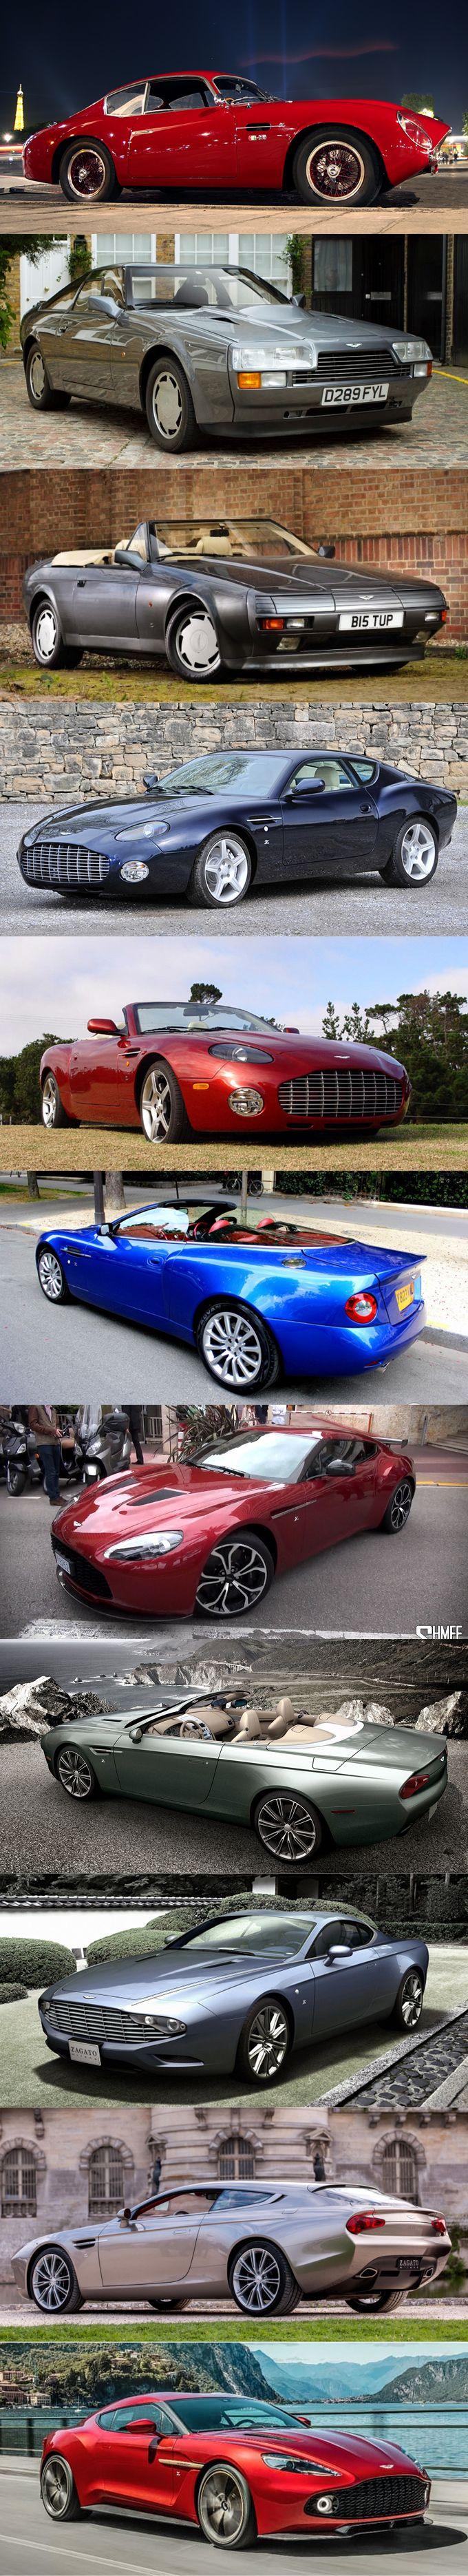 Aston Martin Zagato evolution / 1960 DB4 GT / 1987 V8 Vantage / V8 Volante / 2002 DB7 / 2003 DB AR1 / 2004 Vanquish Roadster (one-off) / 2011 V12 Vantage / 2013 DB9 Spyder / DBS / 2014 Virage Shooting Brake / 2016 Vanquish / UK ITA / red blu gry / #list